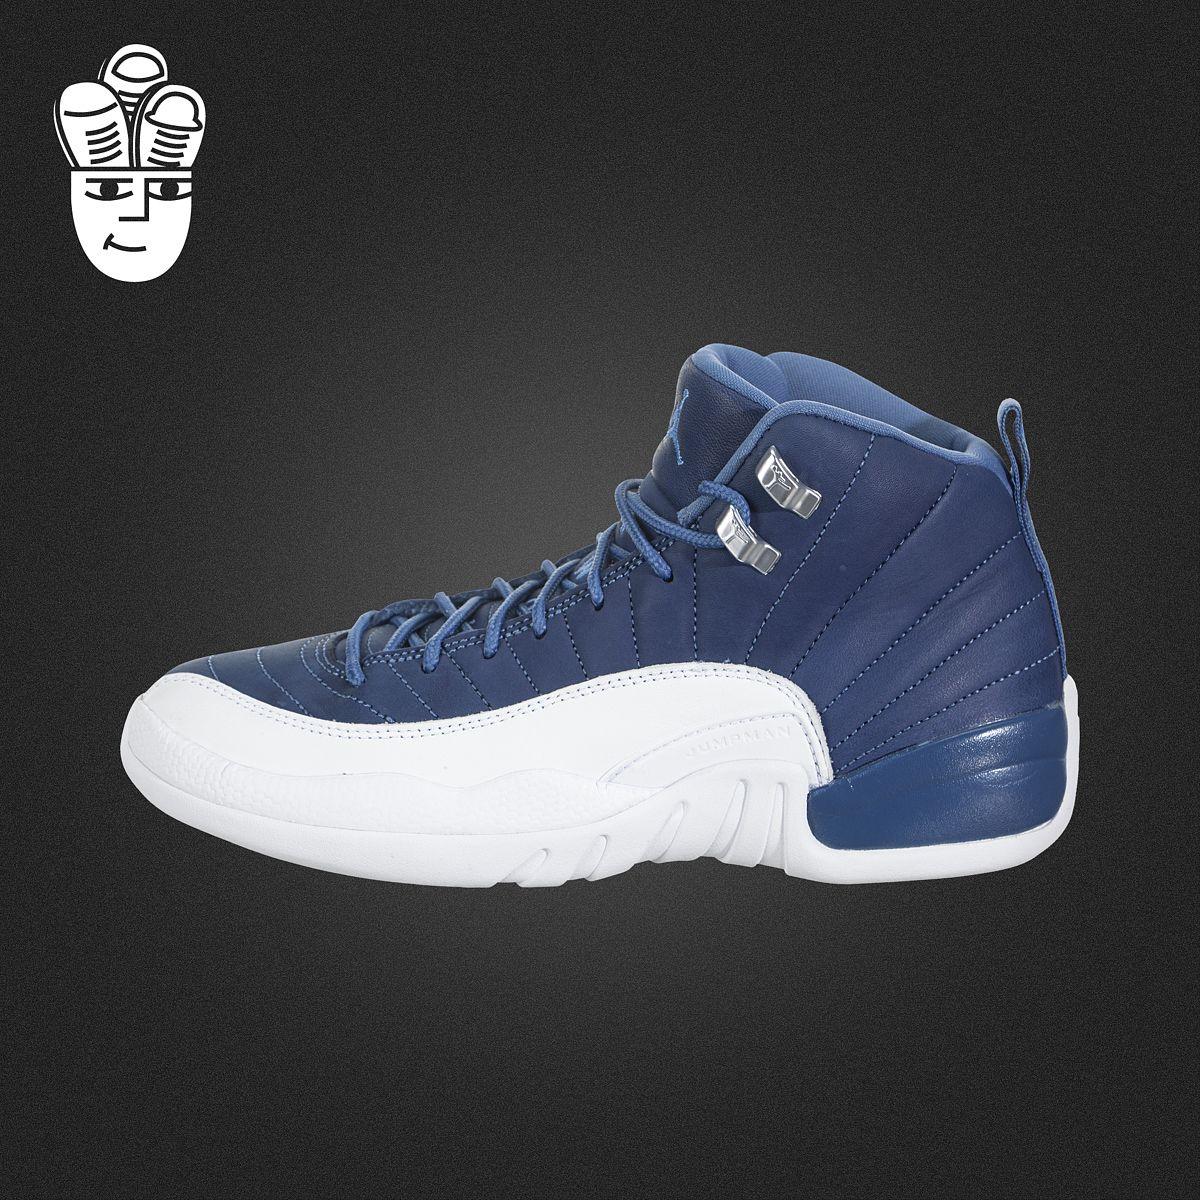 Air Jordan XII Retro SE Indigo AJ乔12男鞋女鞋GS 复古篮球鞋